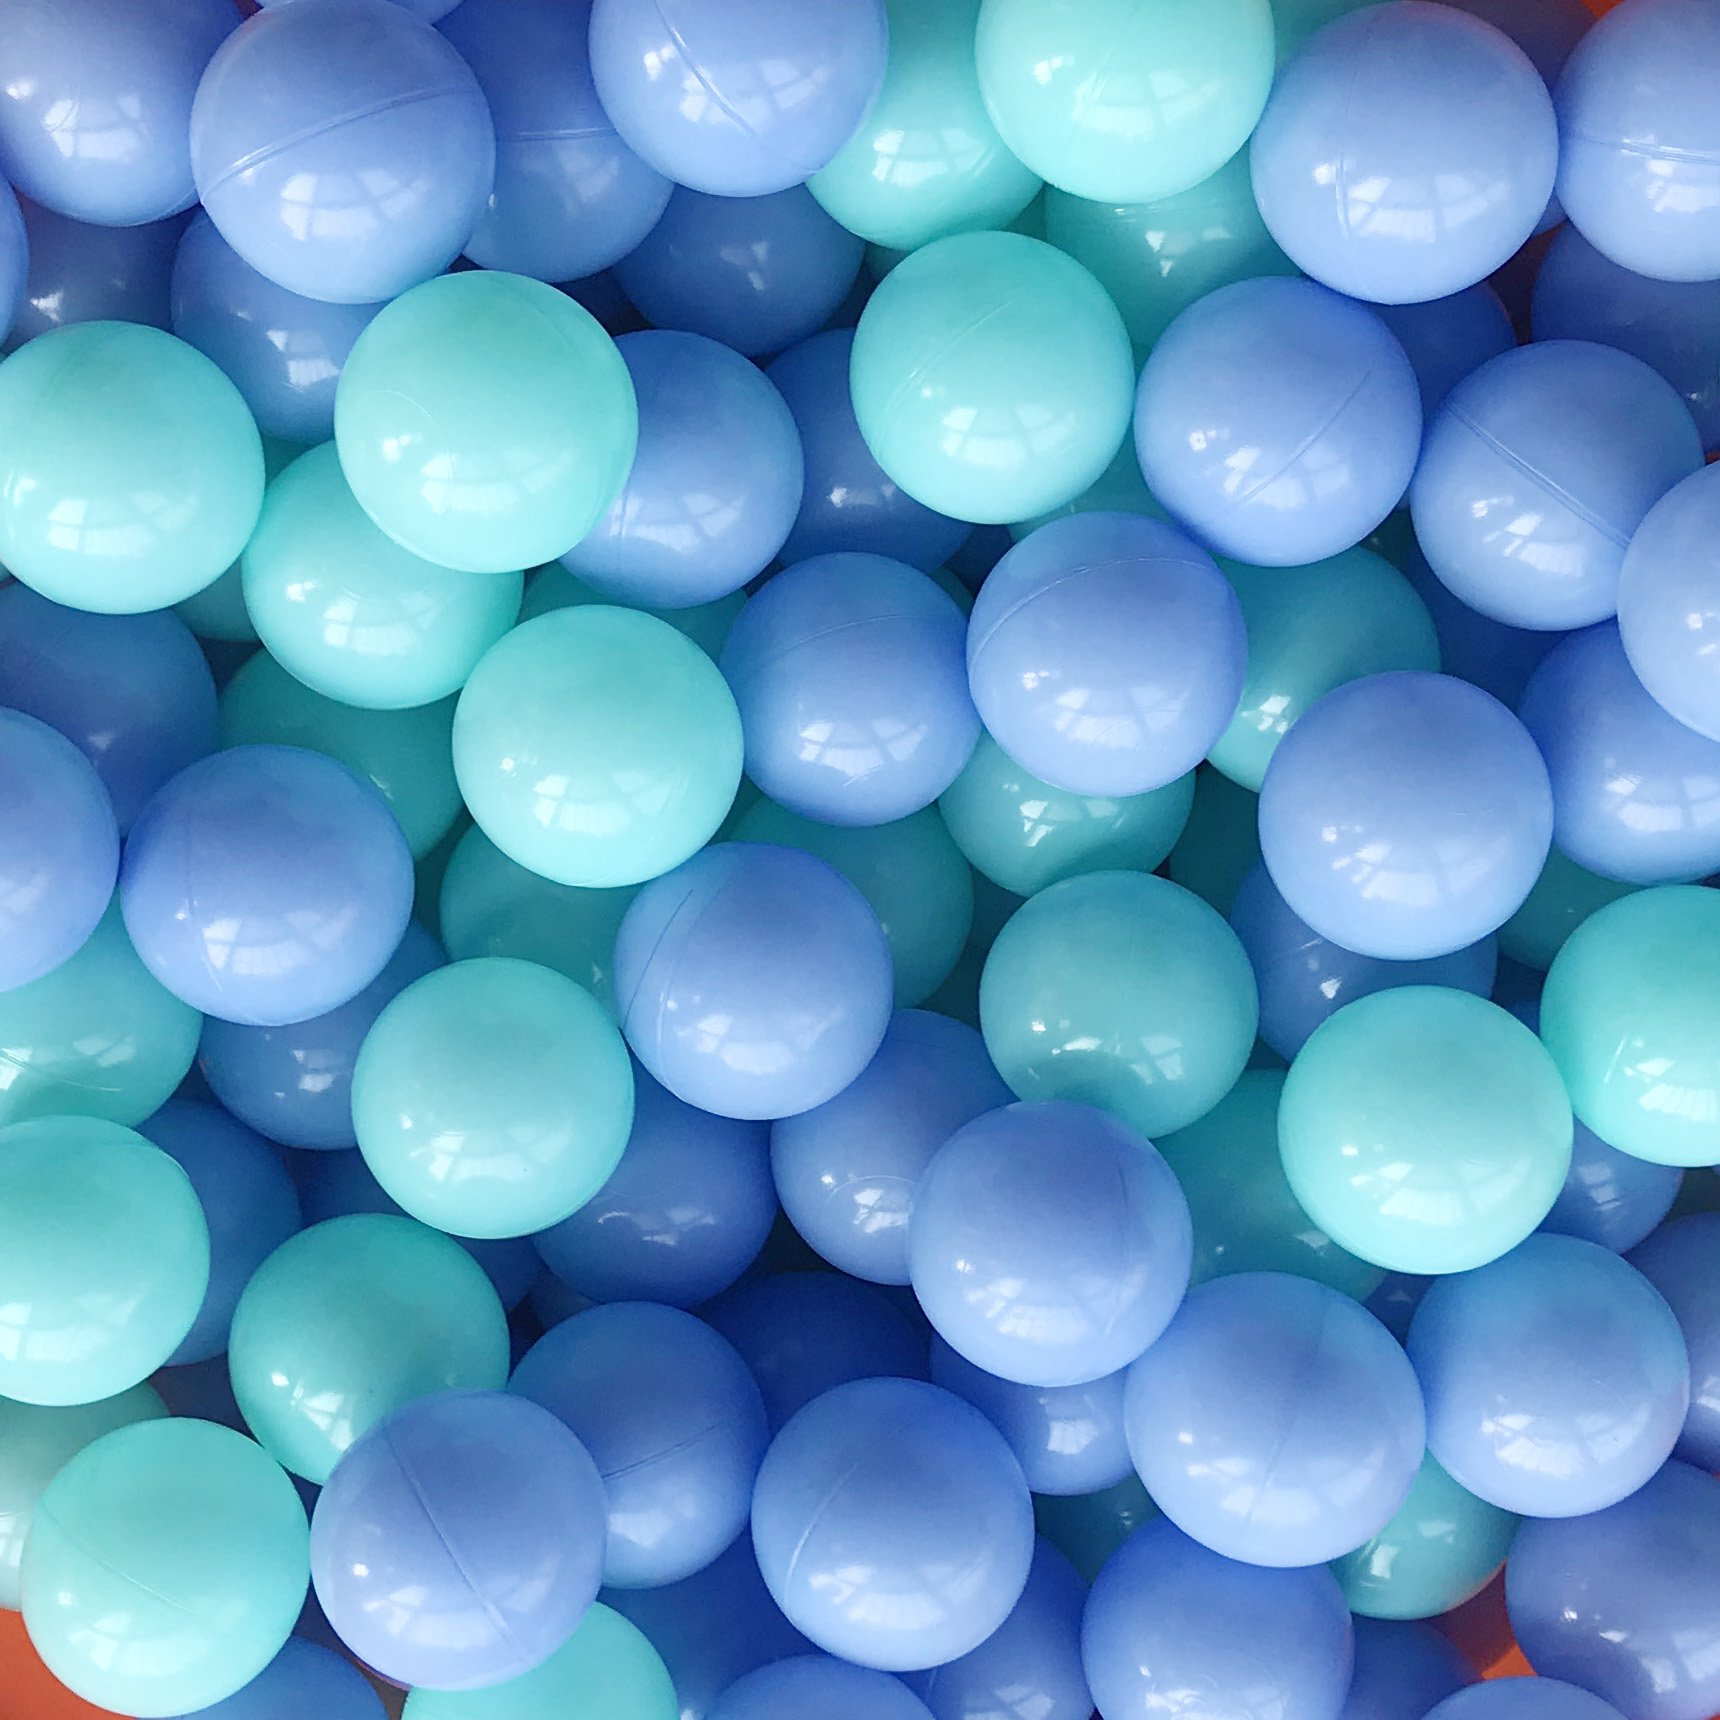 Thense Pit Balls Crush Proof Plastic Children's Toy Balls Macaron Ocean Balls Big Size 2.15 Inch Phthalate & BPA Free Pack of 800 Blue&Green